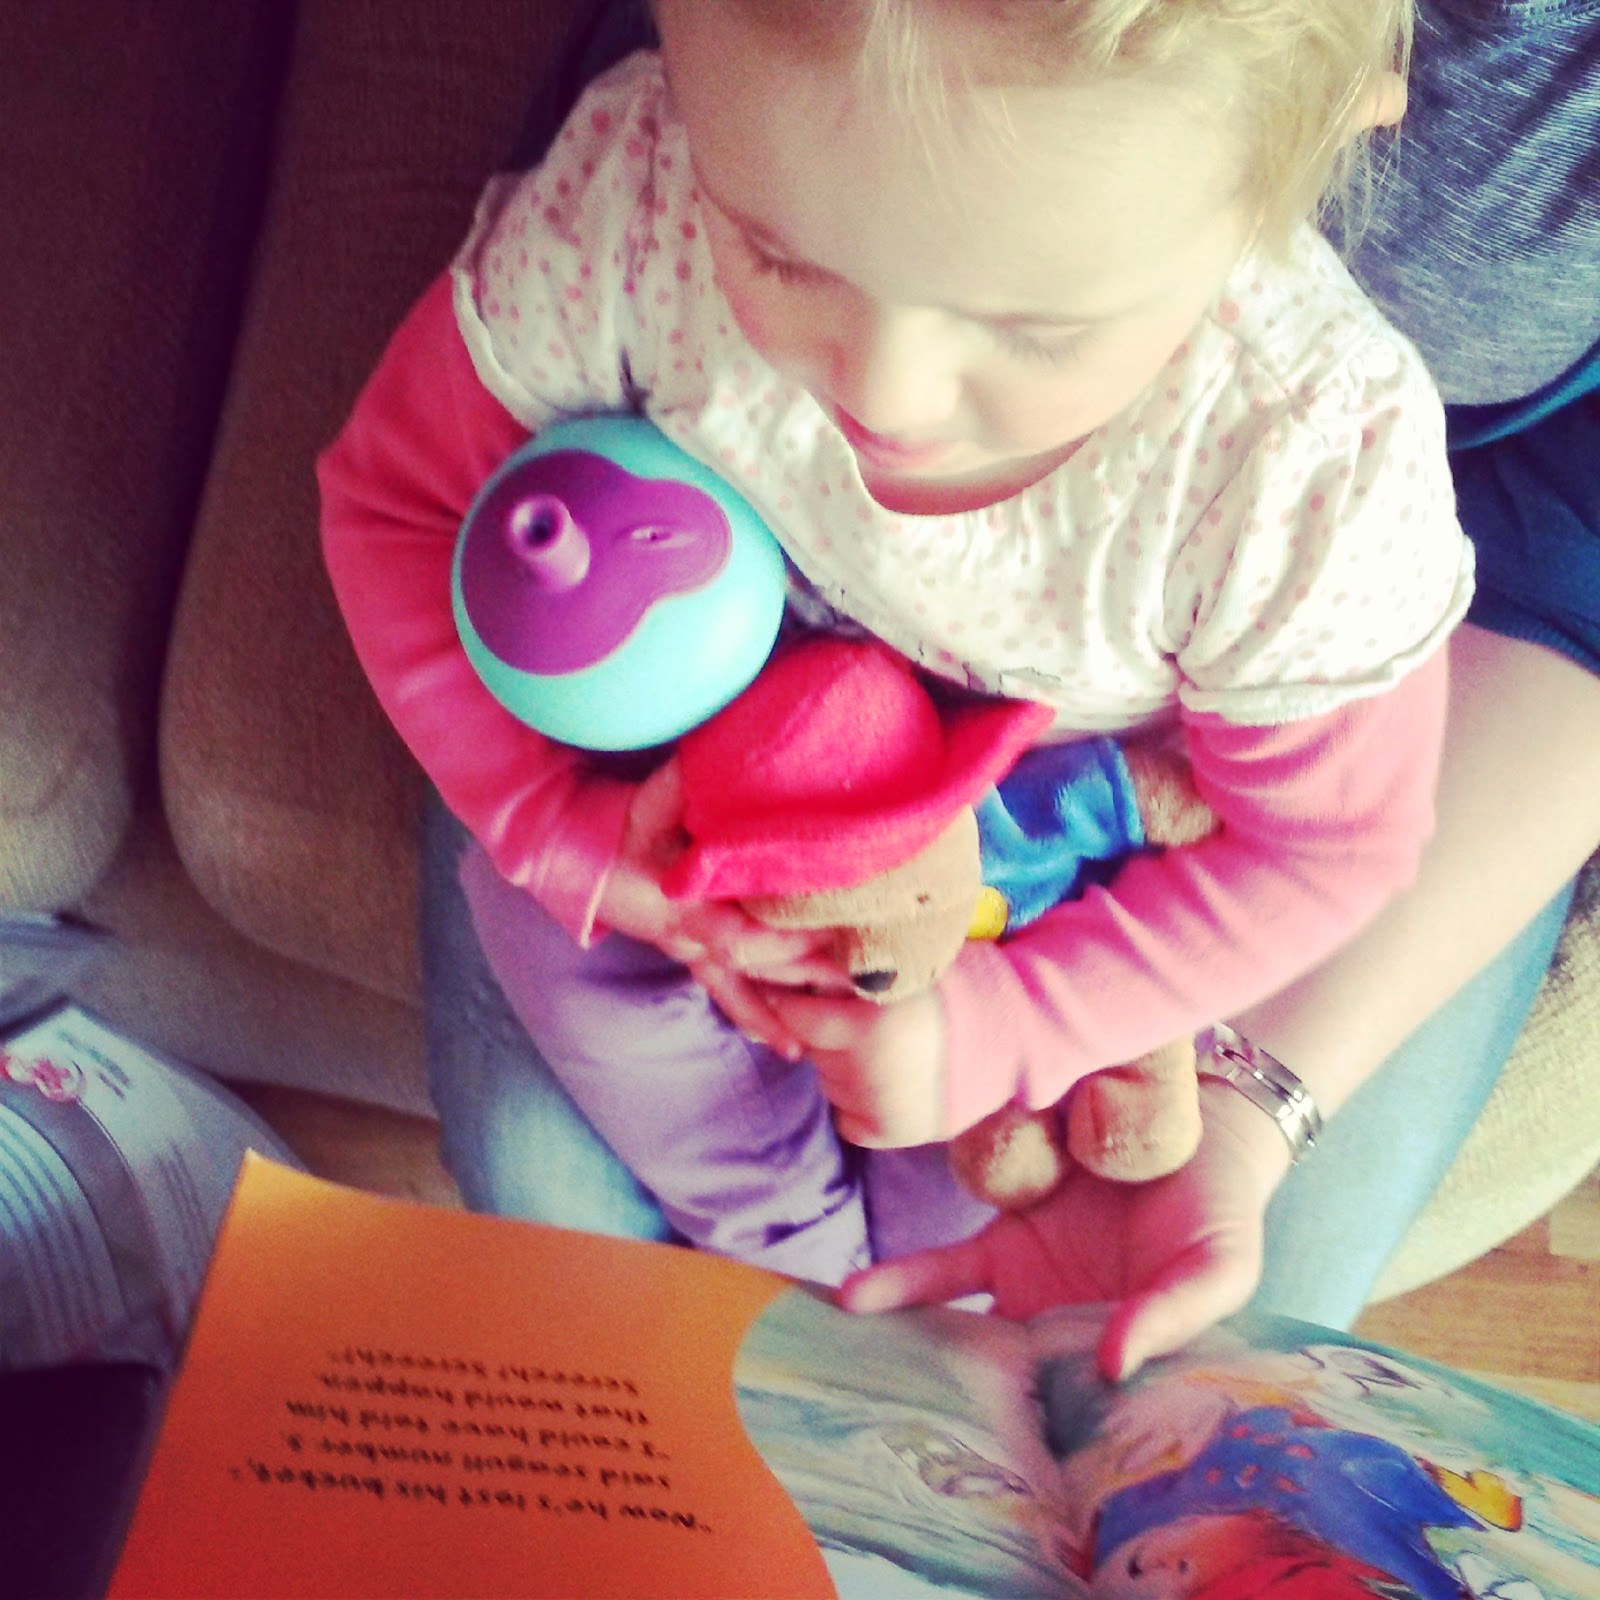 Paddington reads a Paddington book